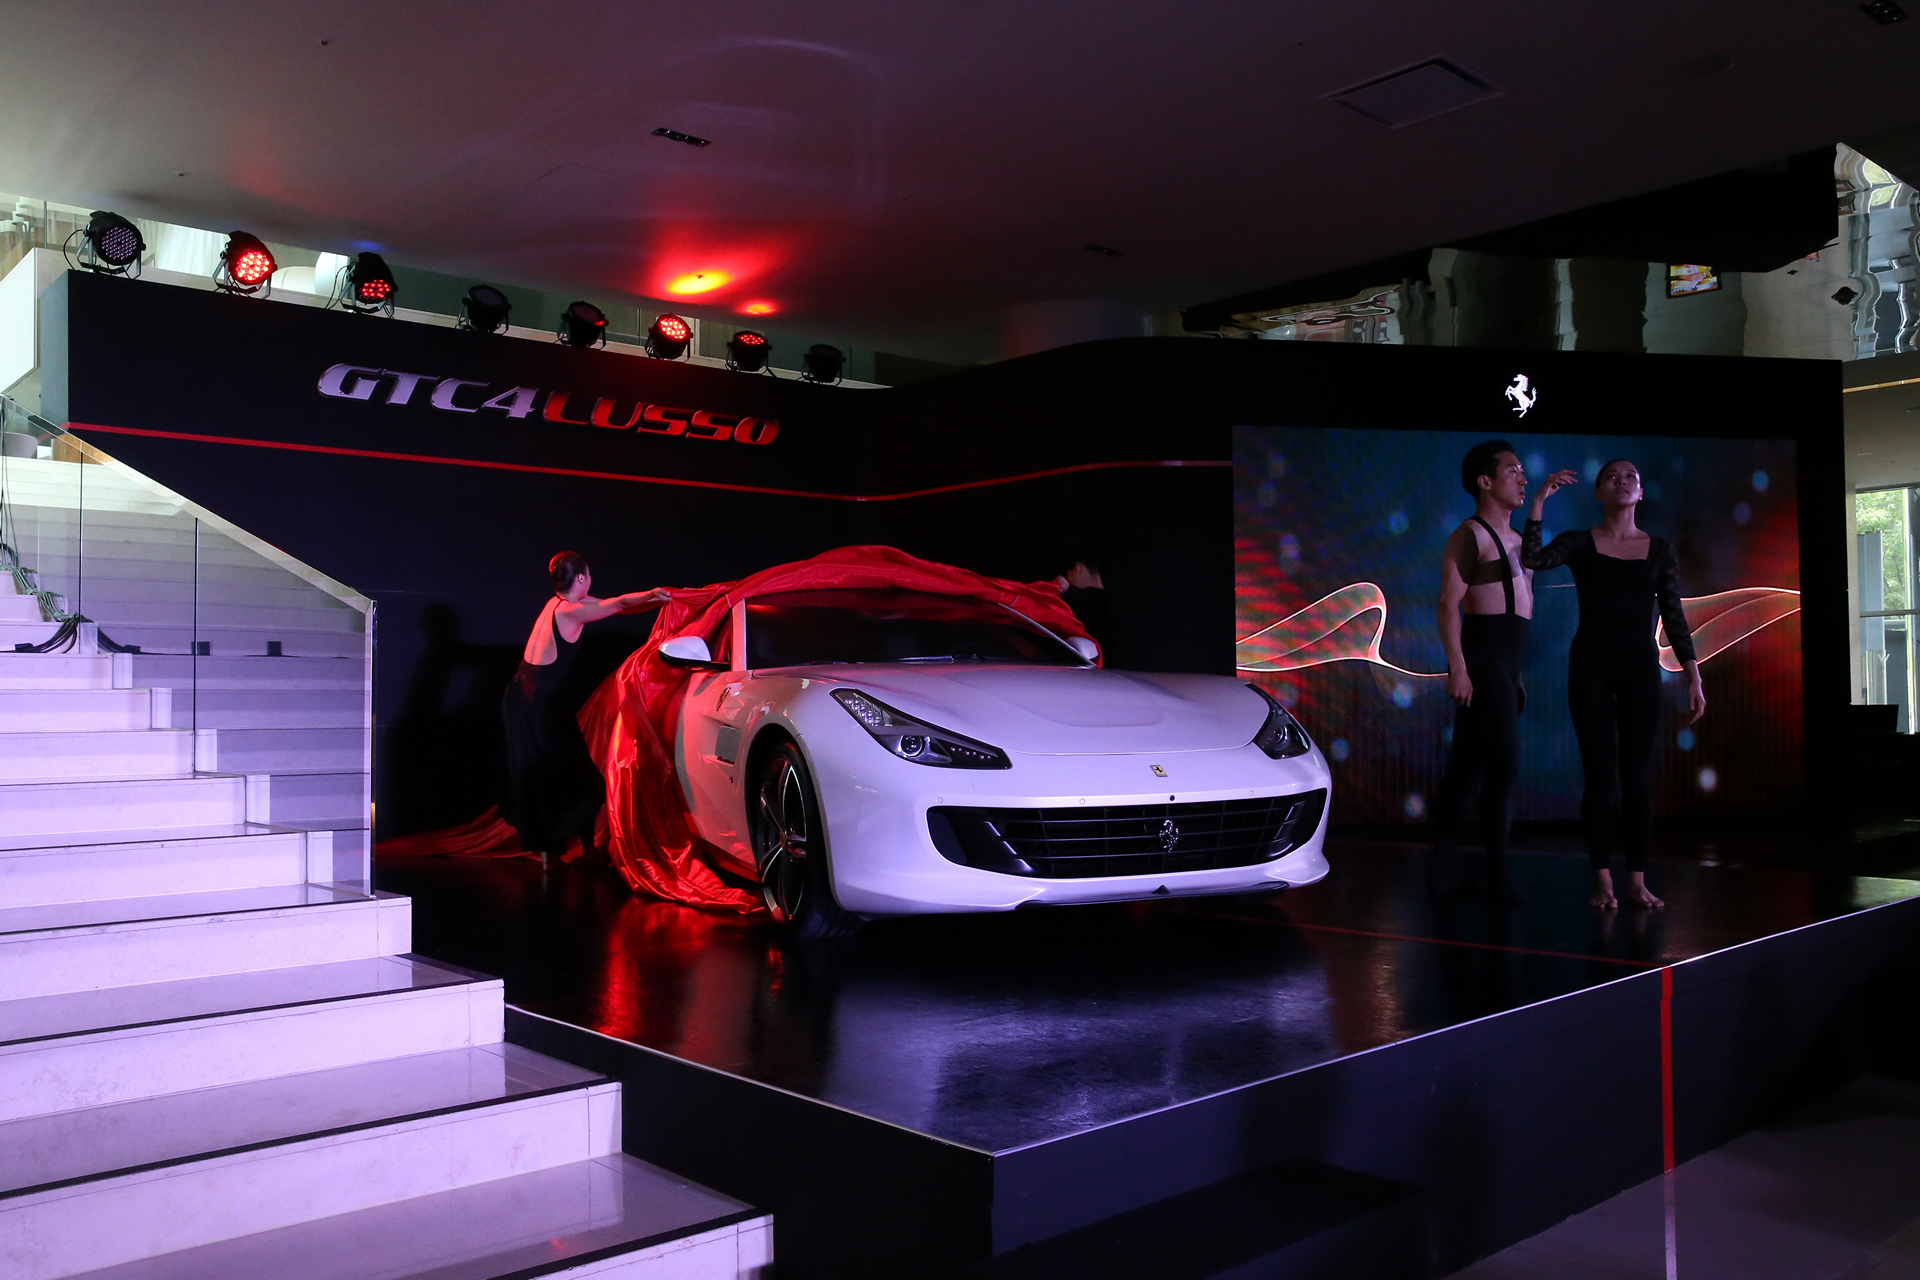 Ferrari GTC4Lusso Korea Premiere © Fiat Chrysler Automobiles N.V.